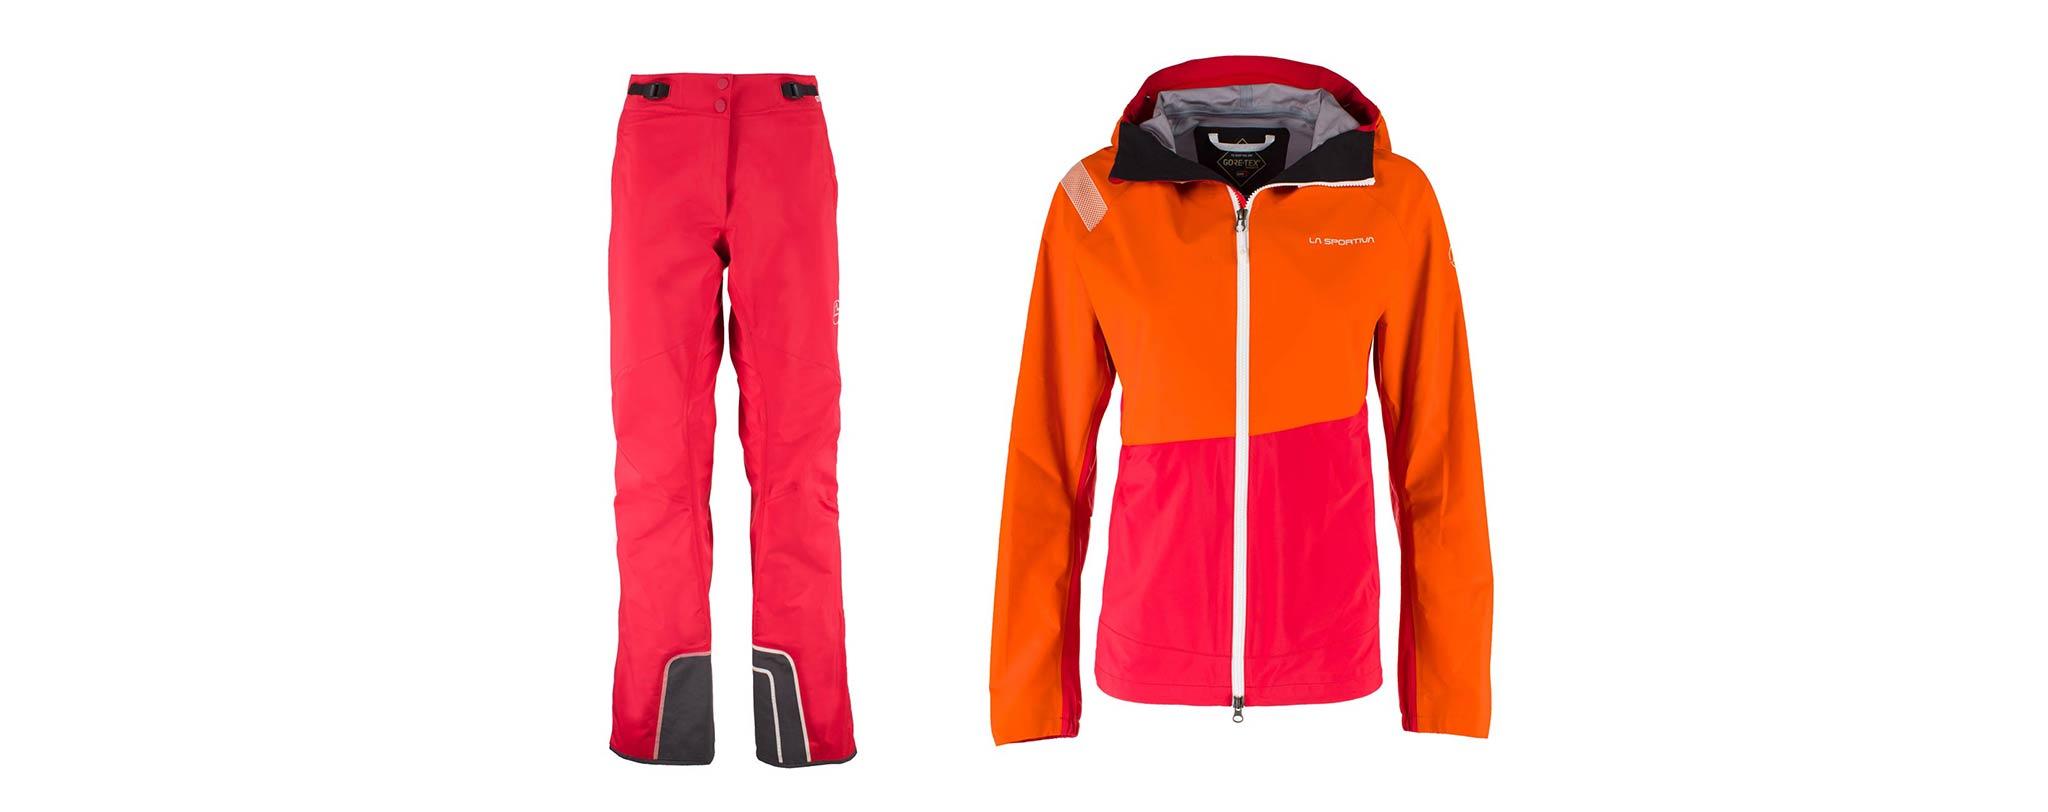 La Sportiva Thema GTX Pant und Jacket